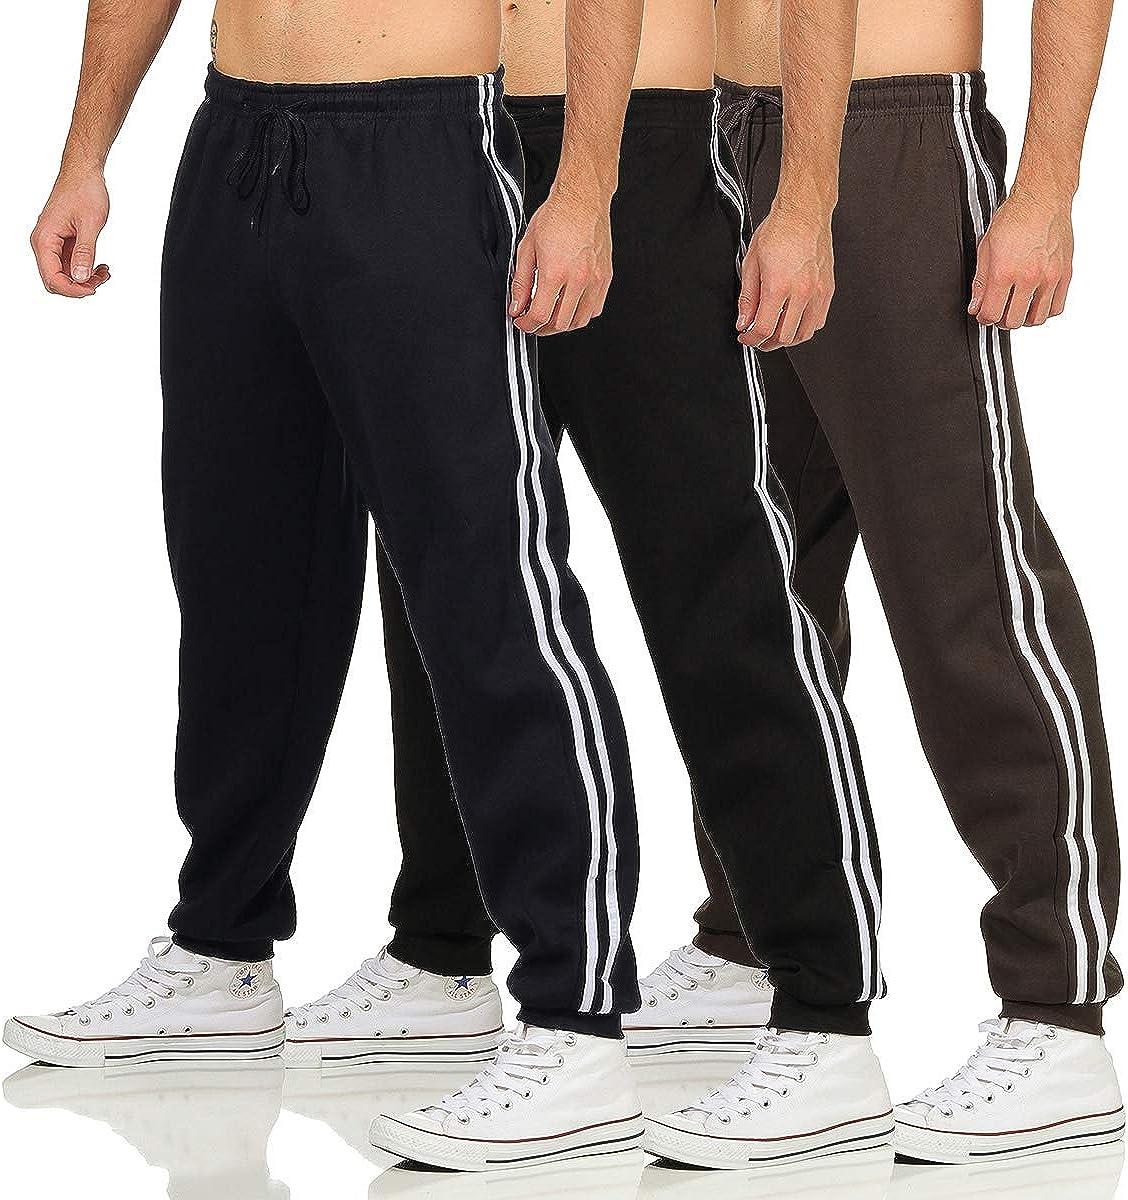 Herren Trainingshose Sporthose Freizeithose Jogginghose mit Seitenstreifen Sport